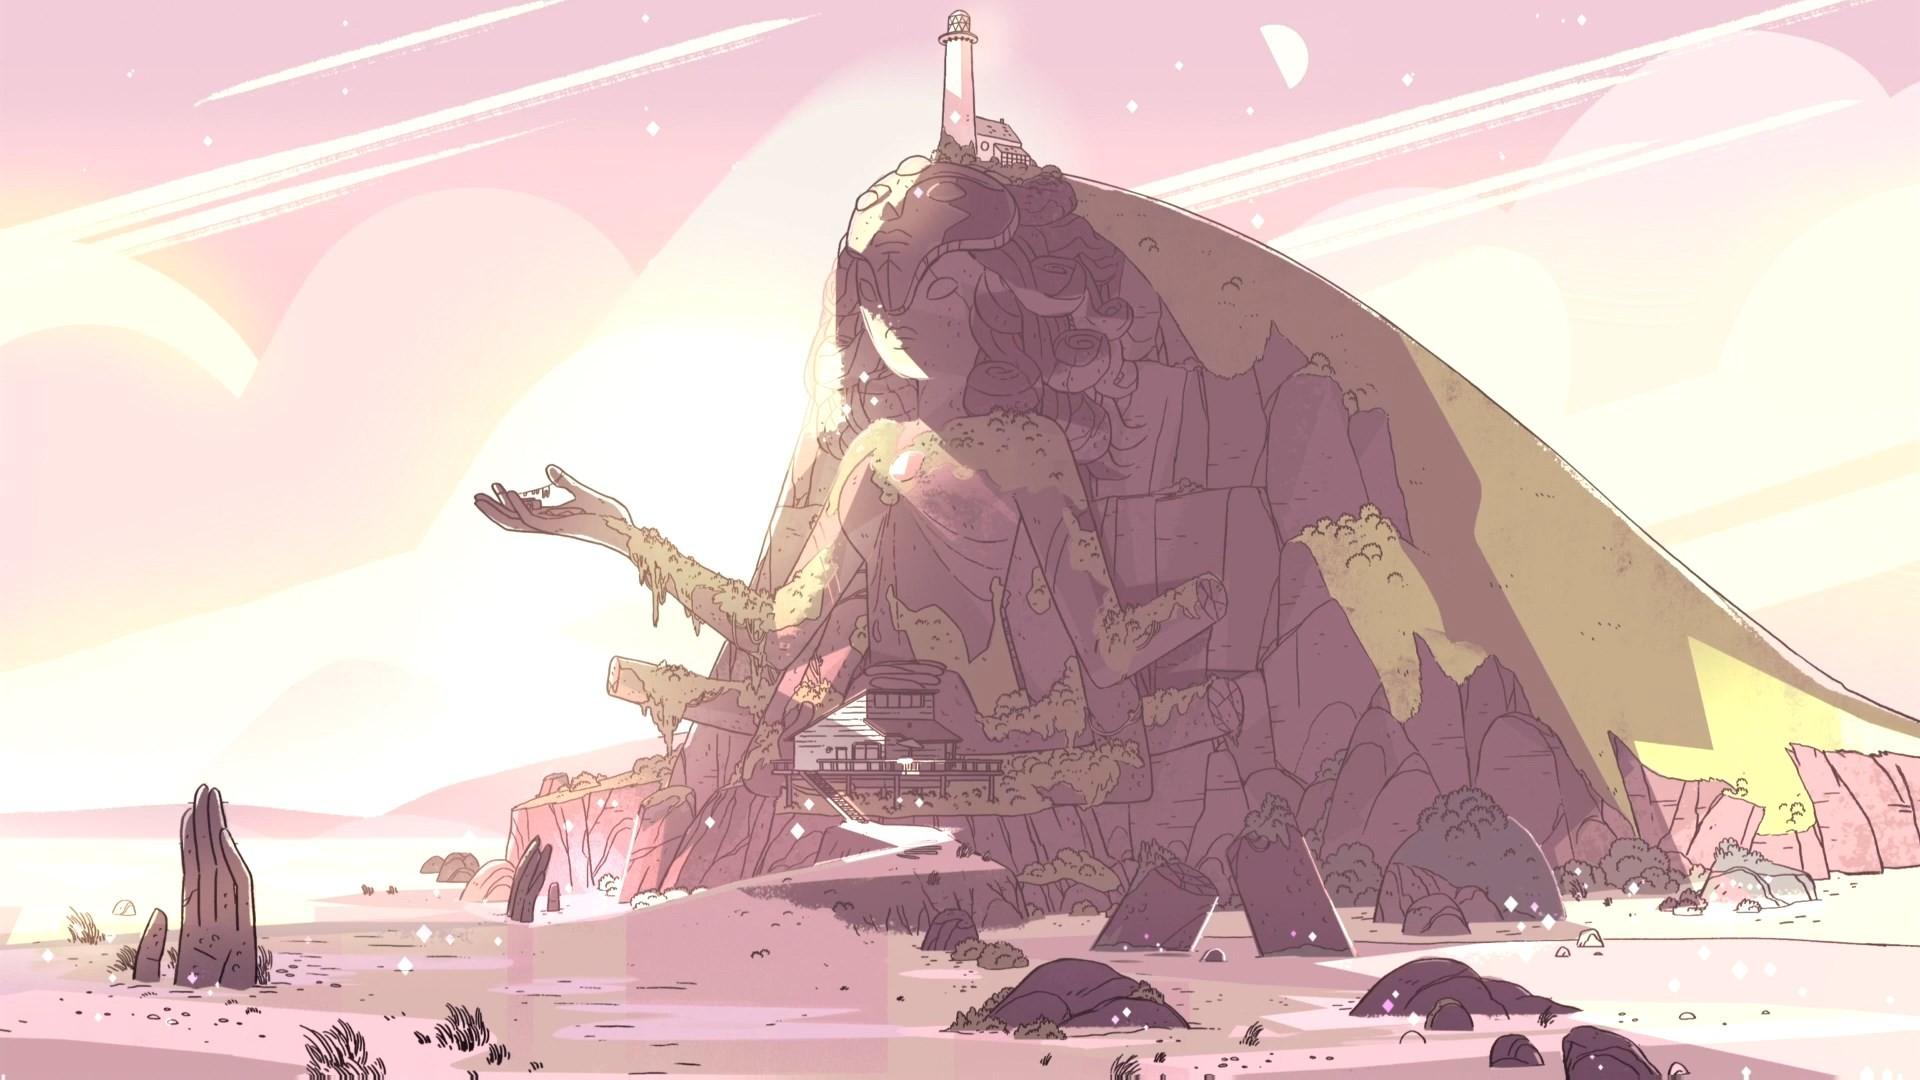 84 Steven Universe Hd Wallpapers - Steven Universe , HD Wallpaper & Backgrounds